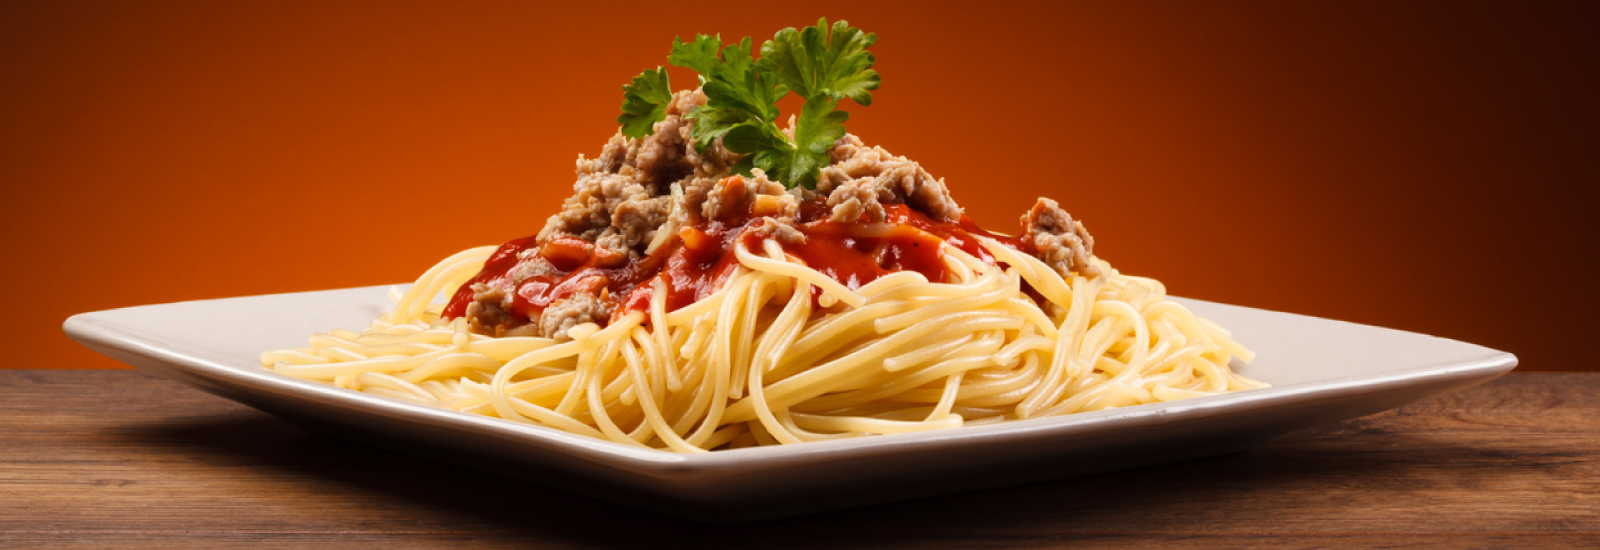 Italian Restaurants in Yuma, AZ